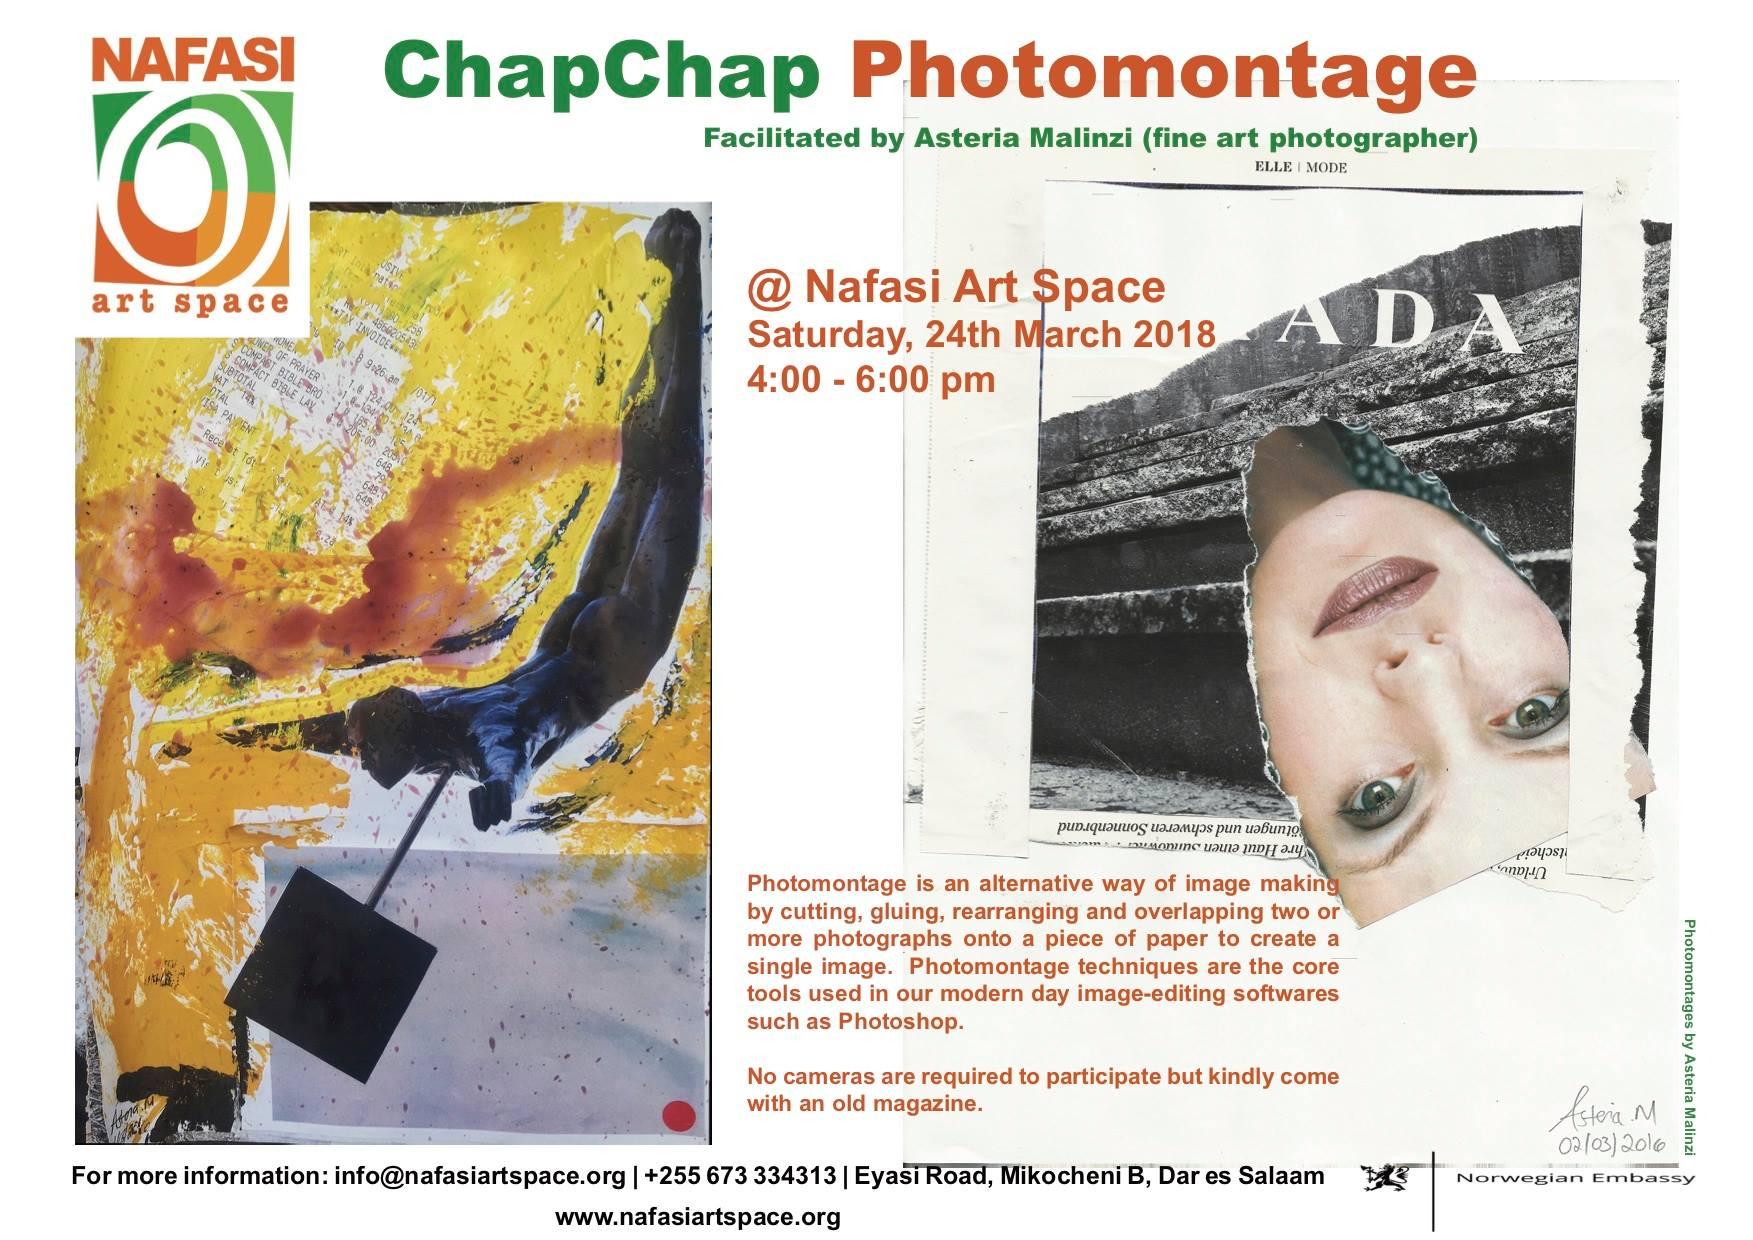 Poster for ChapChap Photomontage: Public Art Workshop at Nafasi Art Space